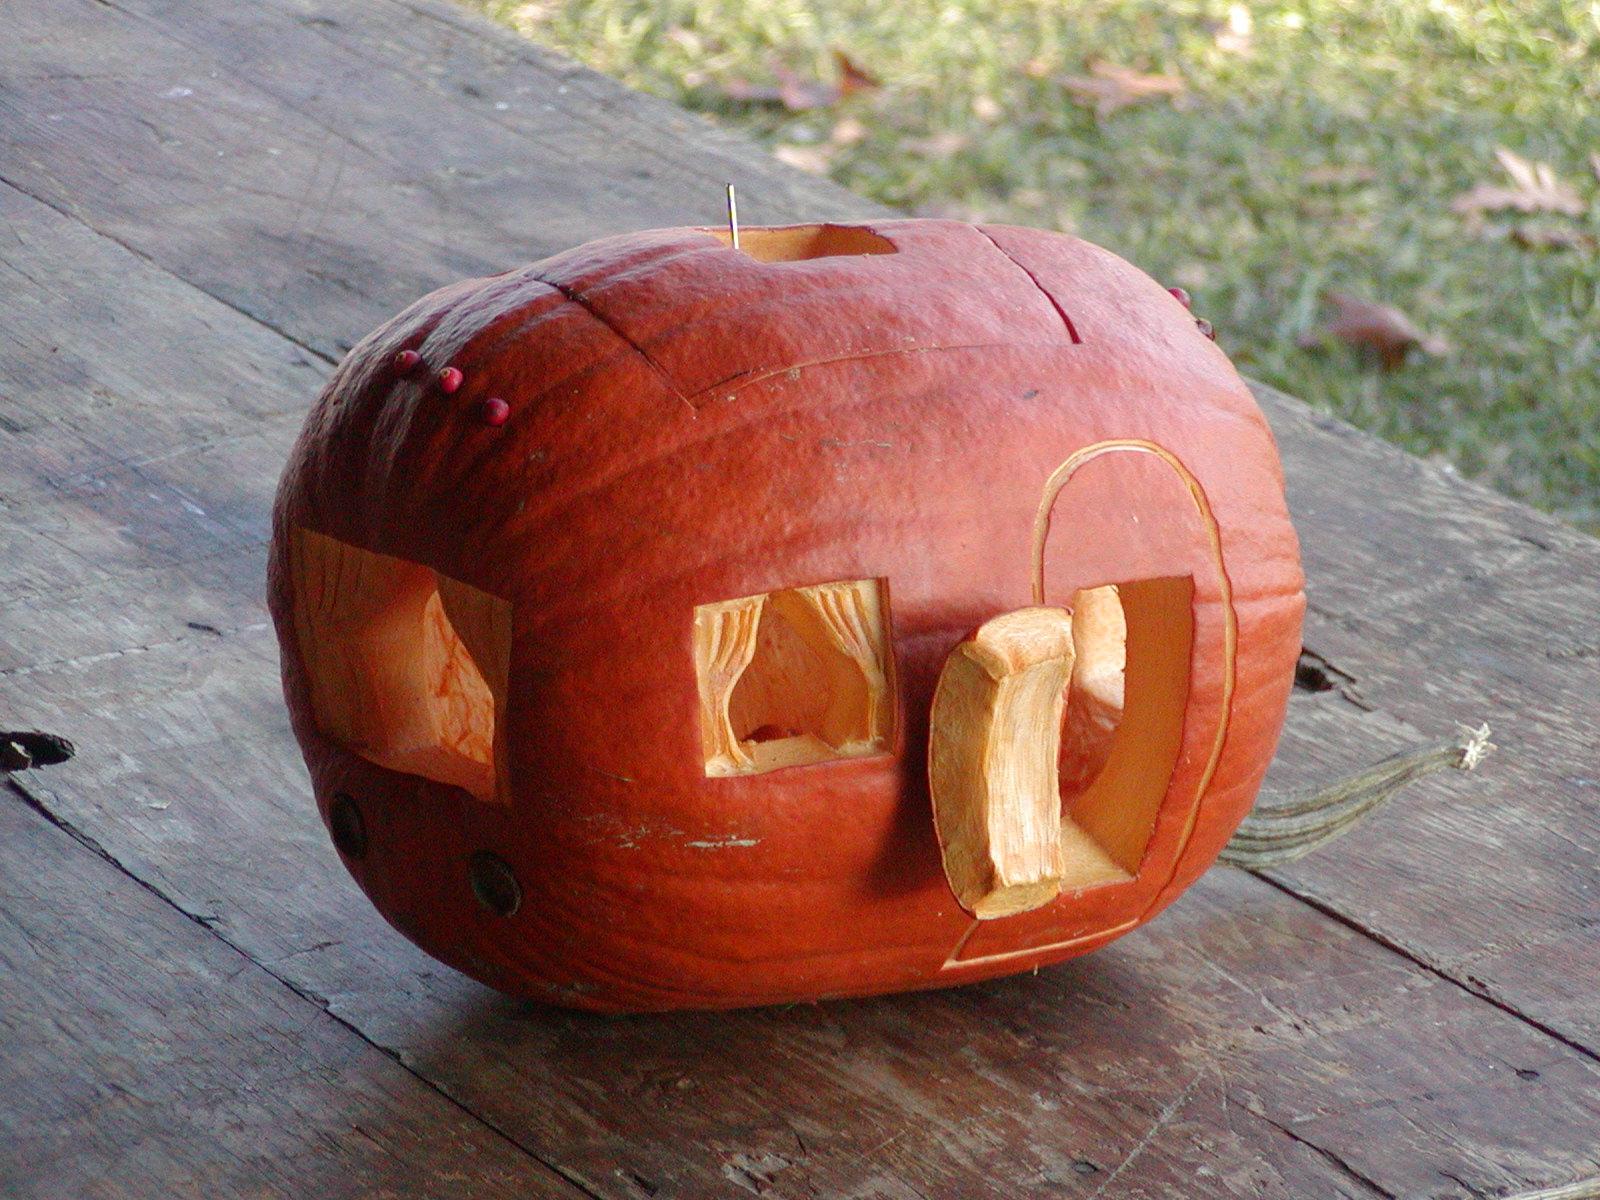 Click image for larger version  Name:Falluminum08-Pumpkin-PB090012.JPG Views:62 Size:459.4 KB ID:71293